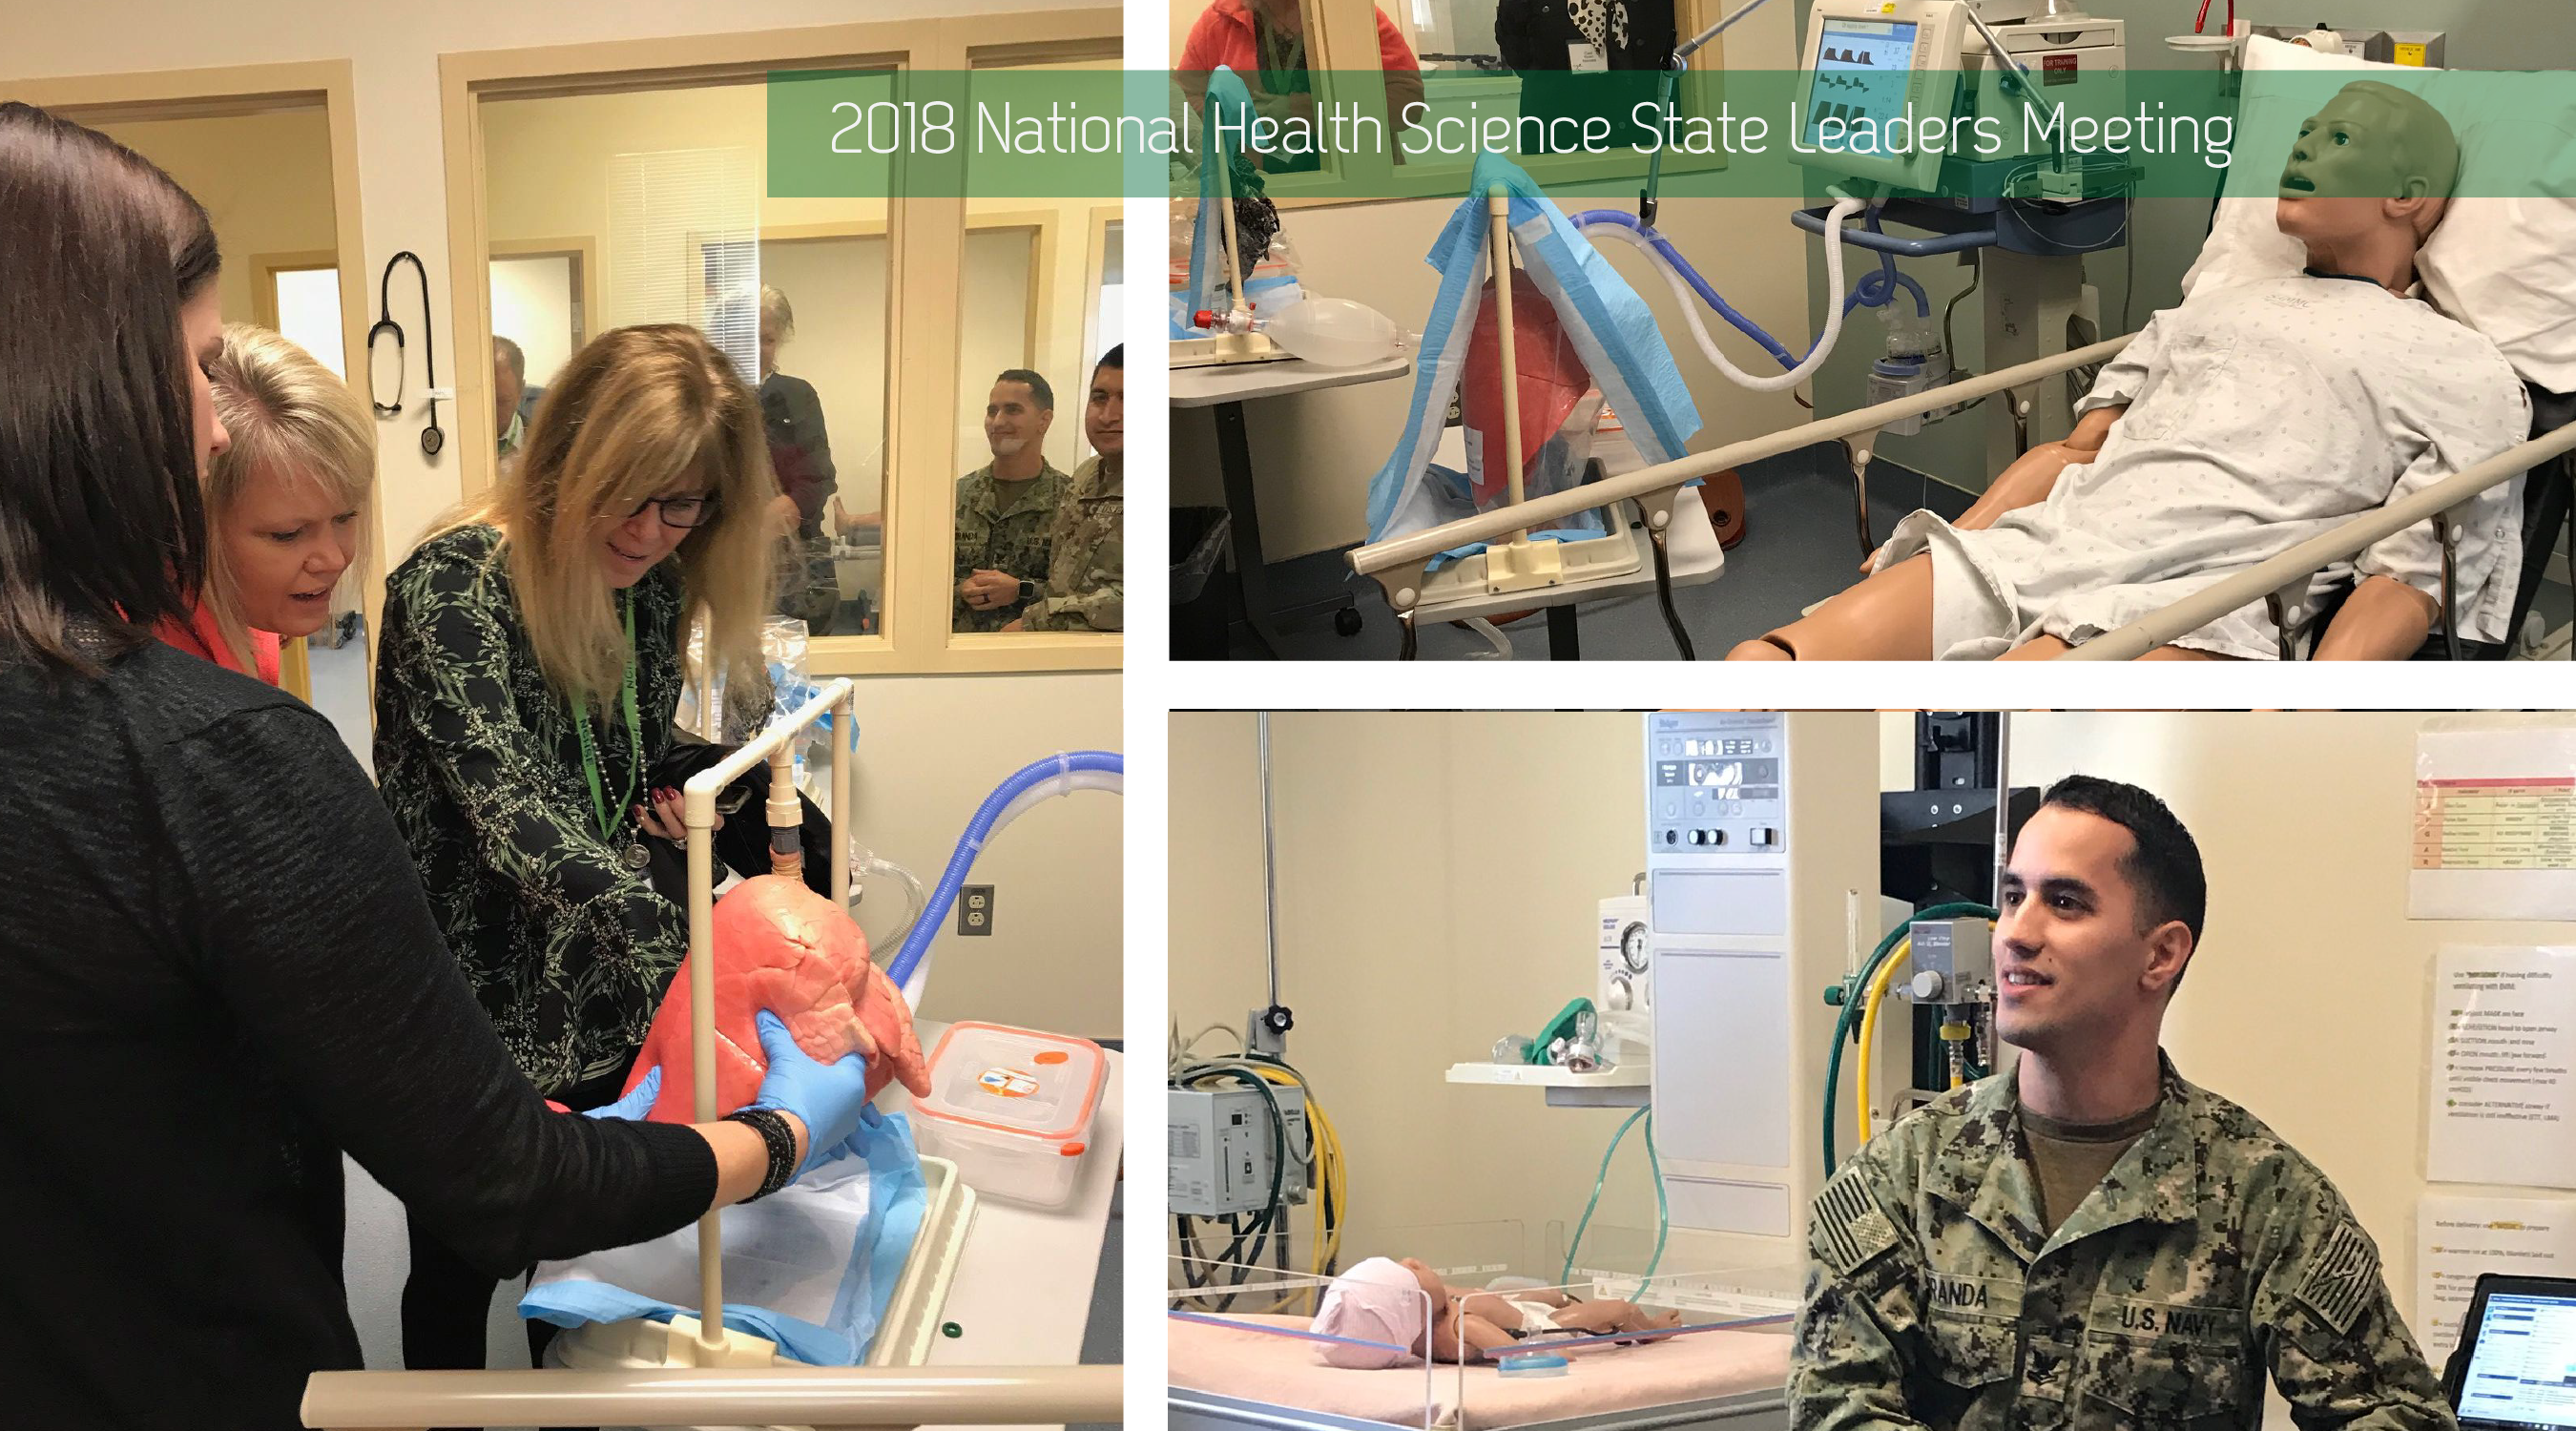 2018 National Health Science State Leaders Meeting